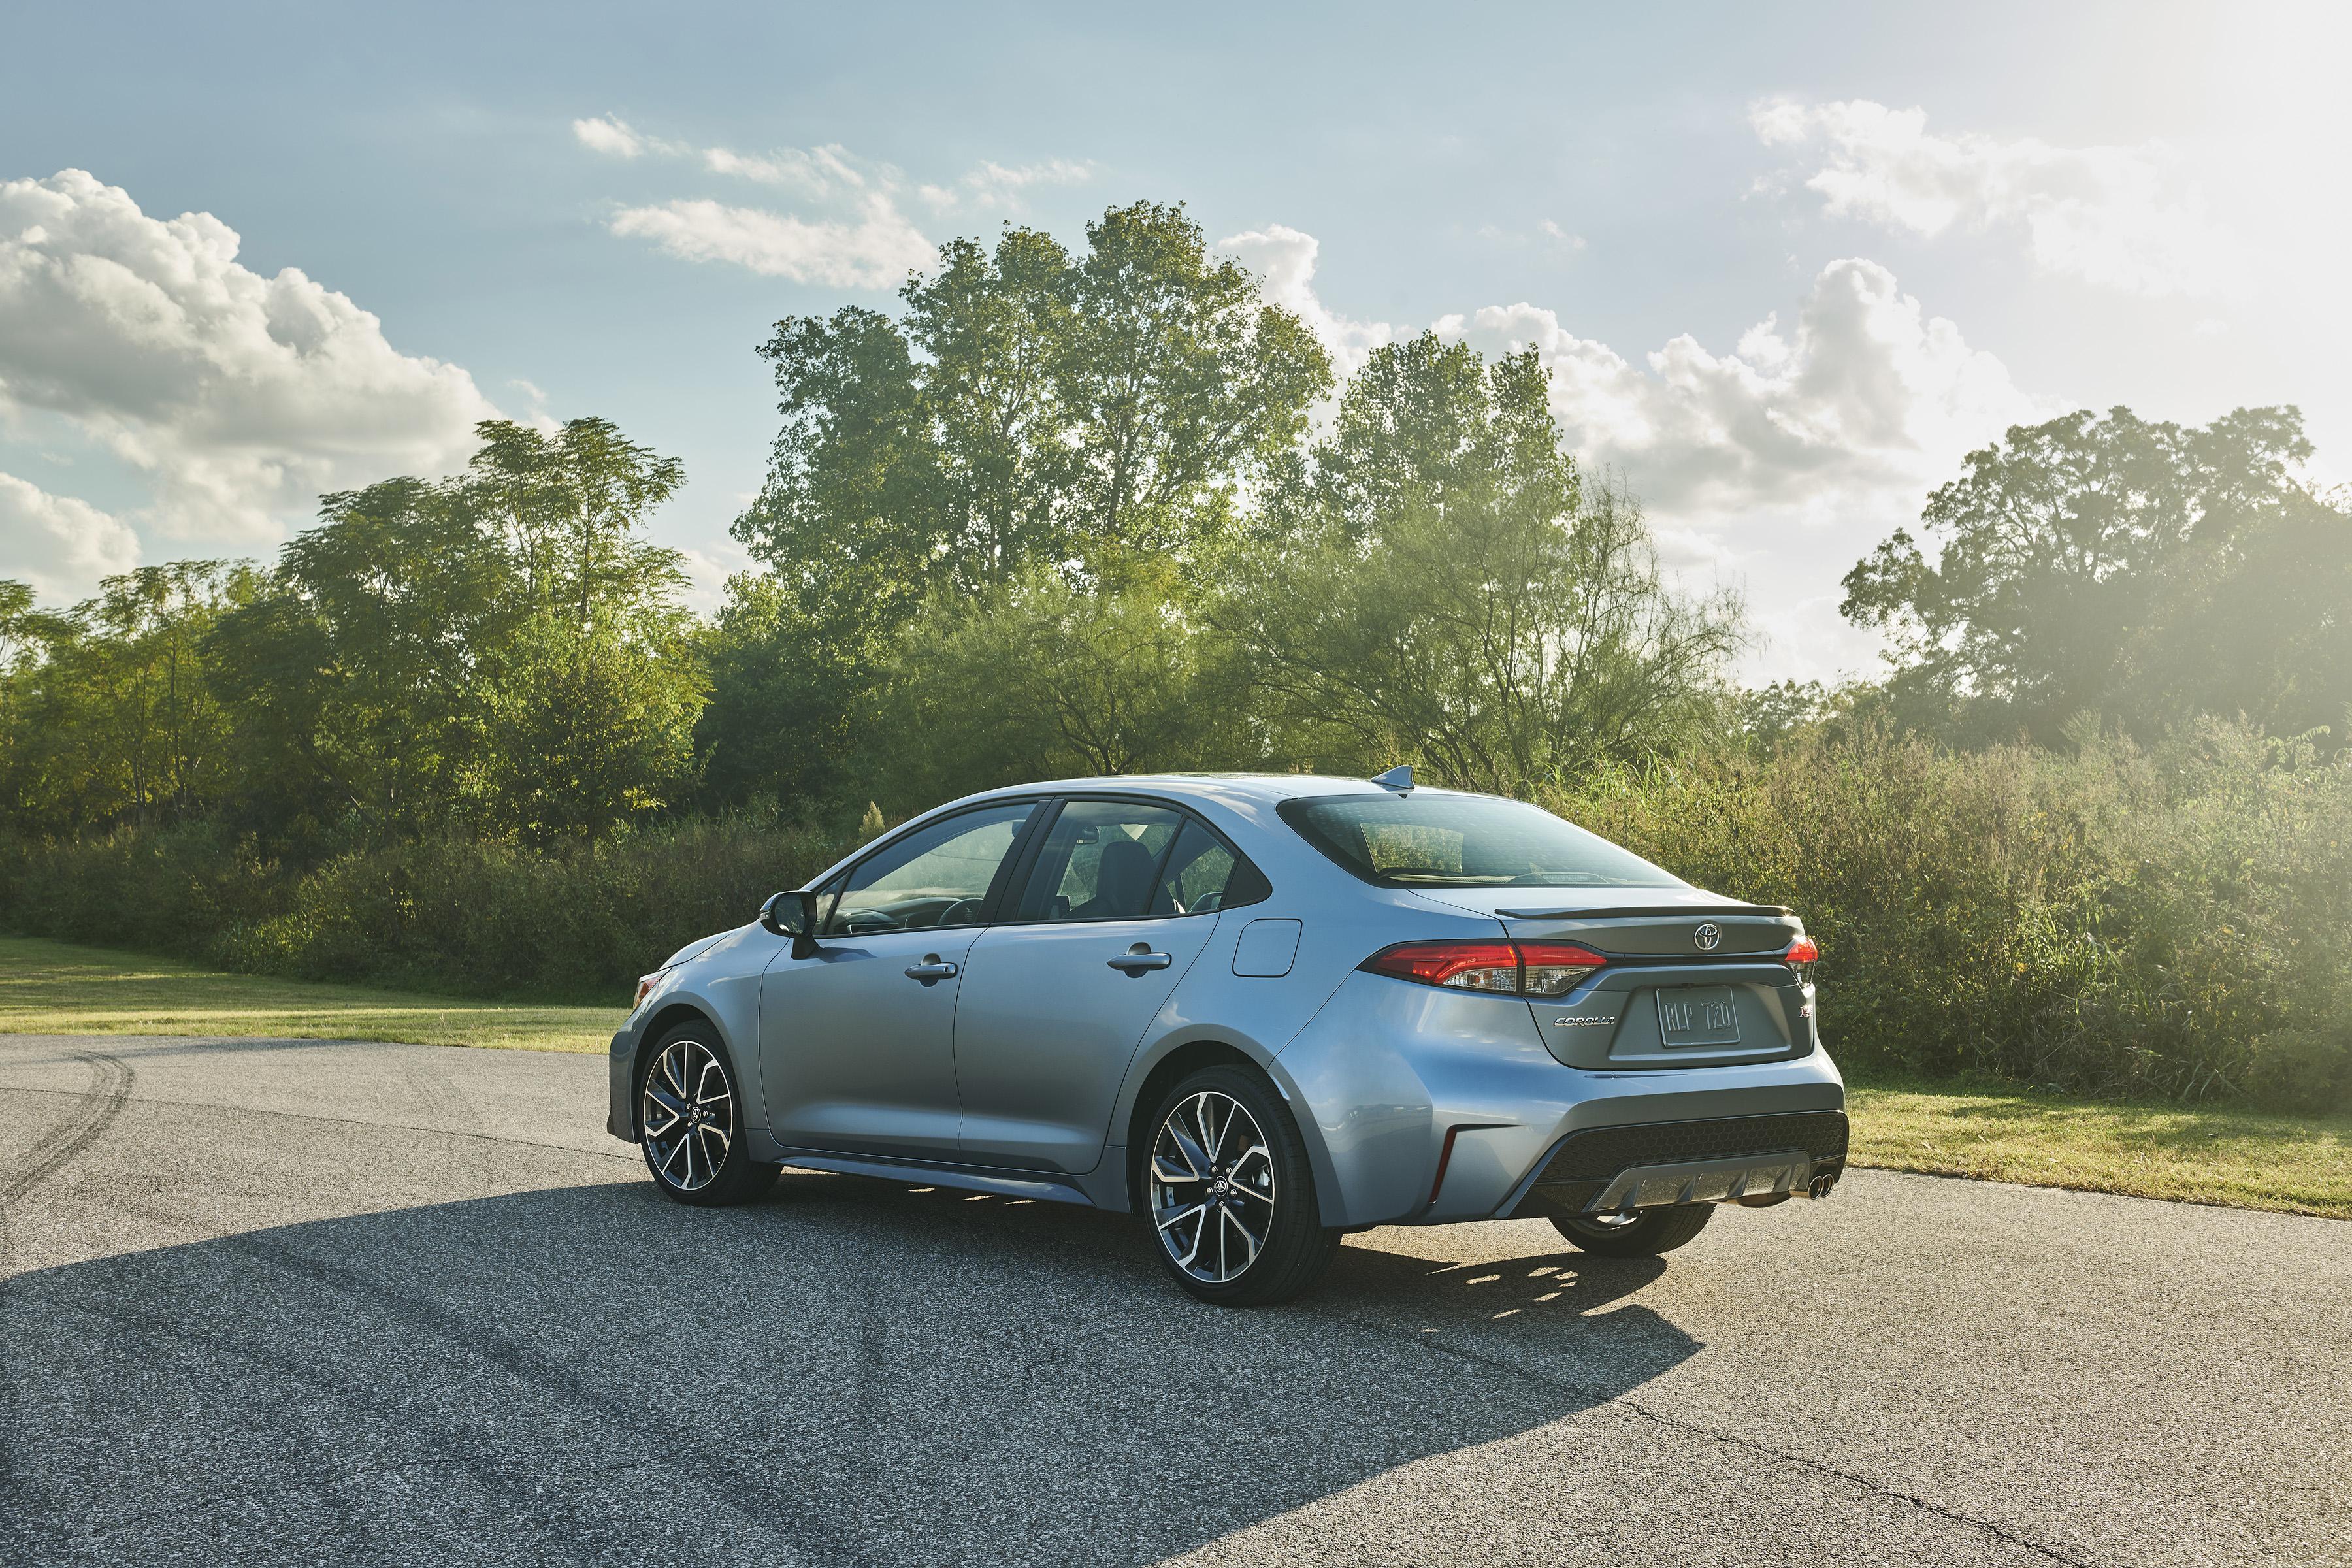 Toyota: Next-gen 2020 Corolla ups UHSS steel, revamps noise